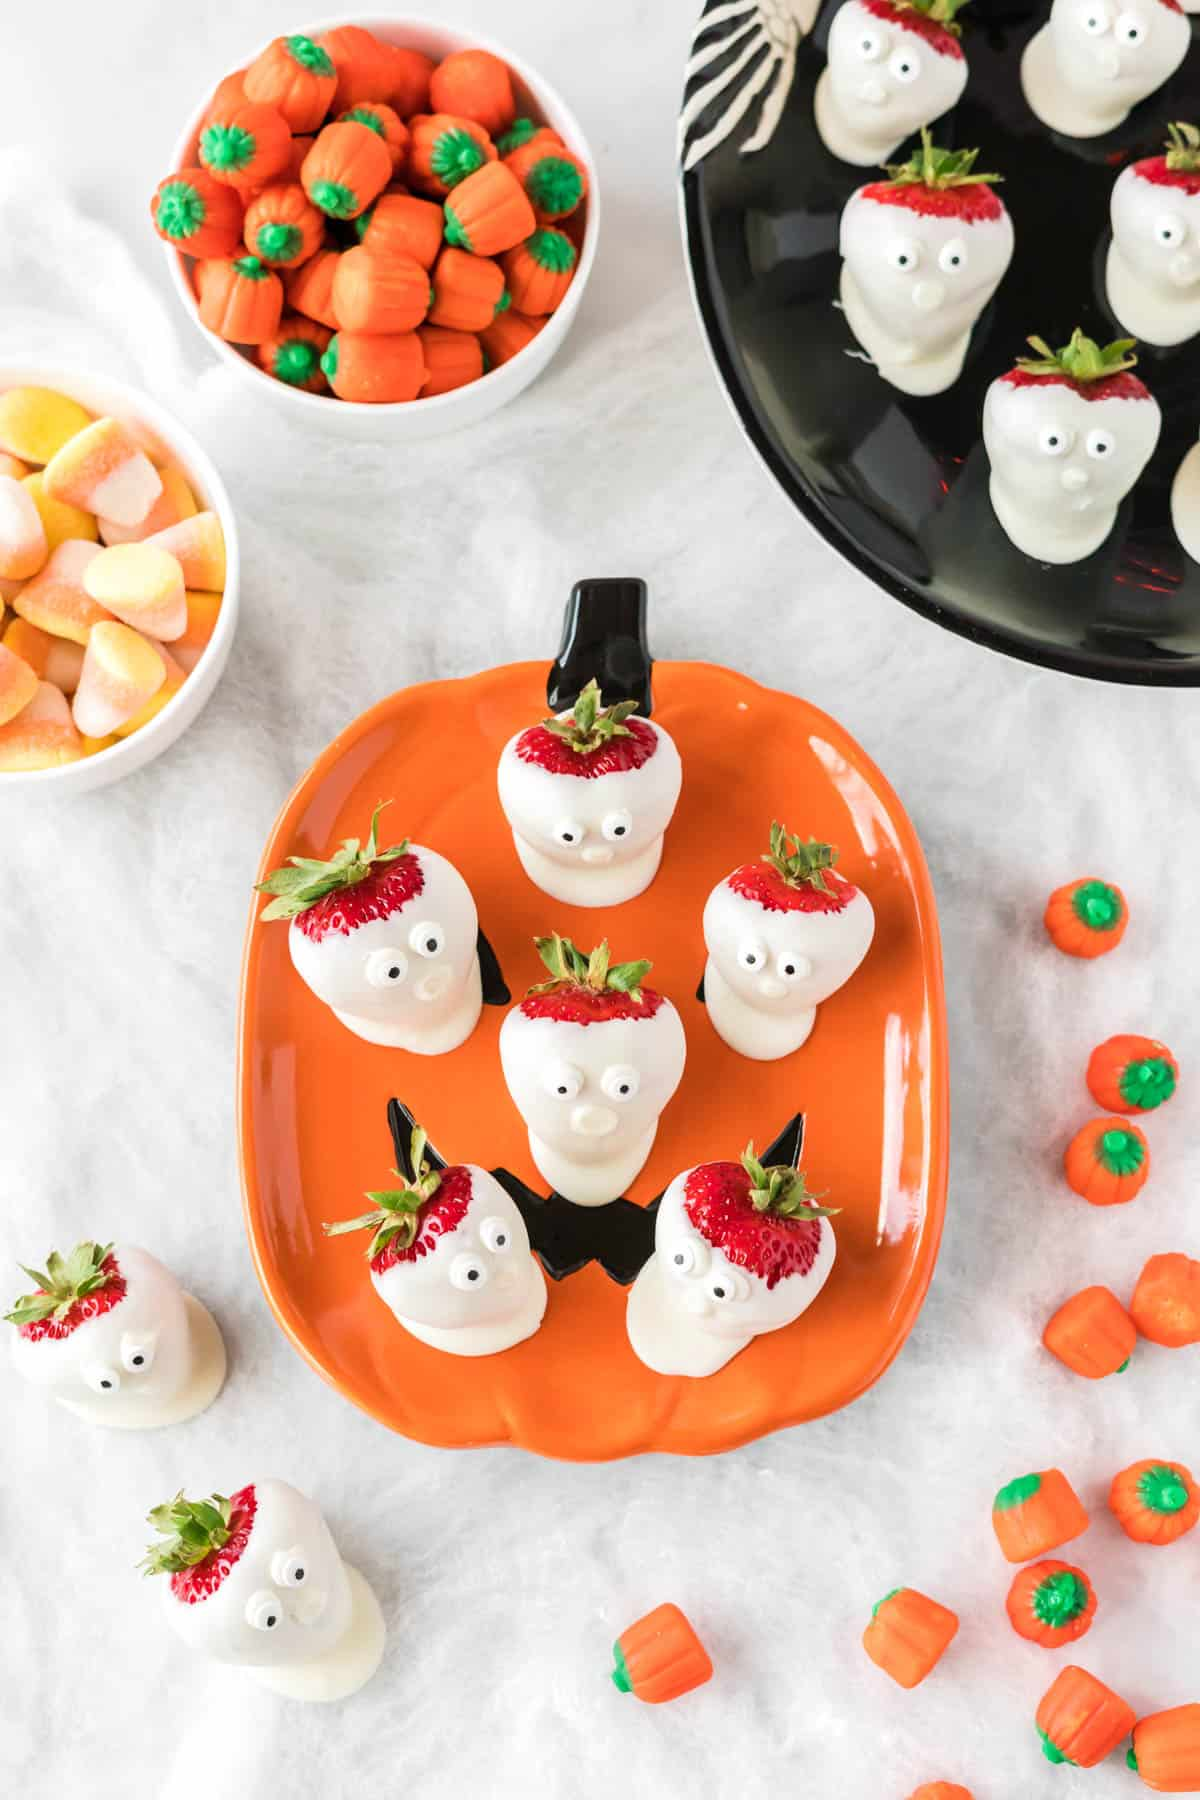 strawberry ghosts on hallloween plates